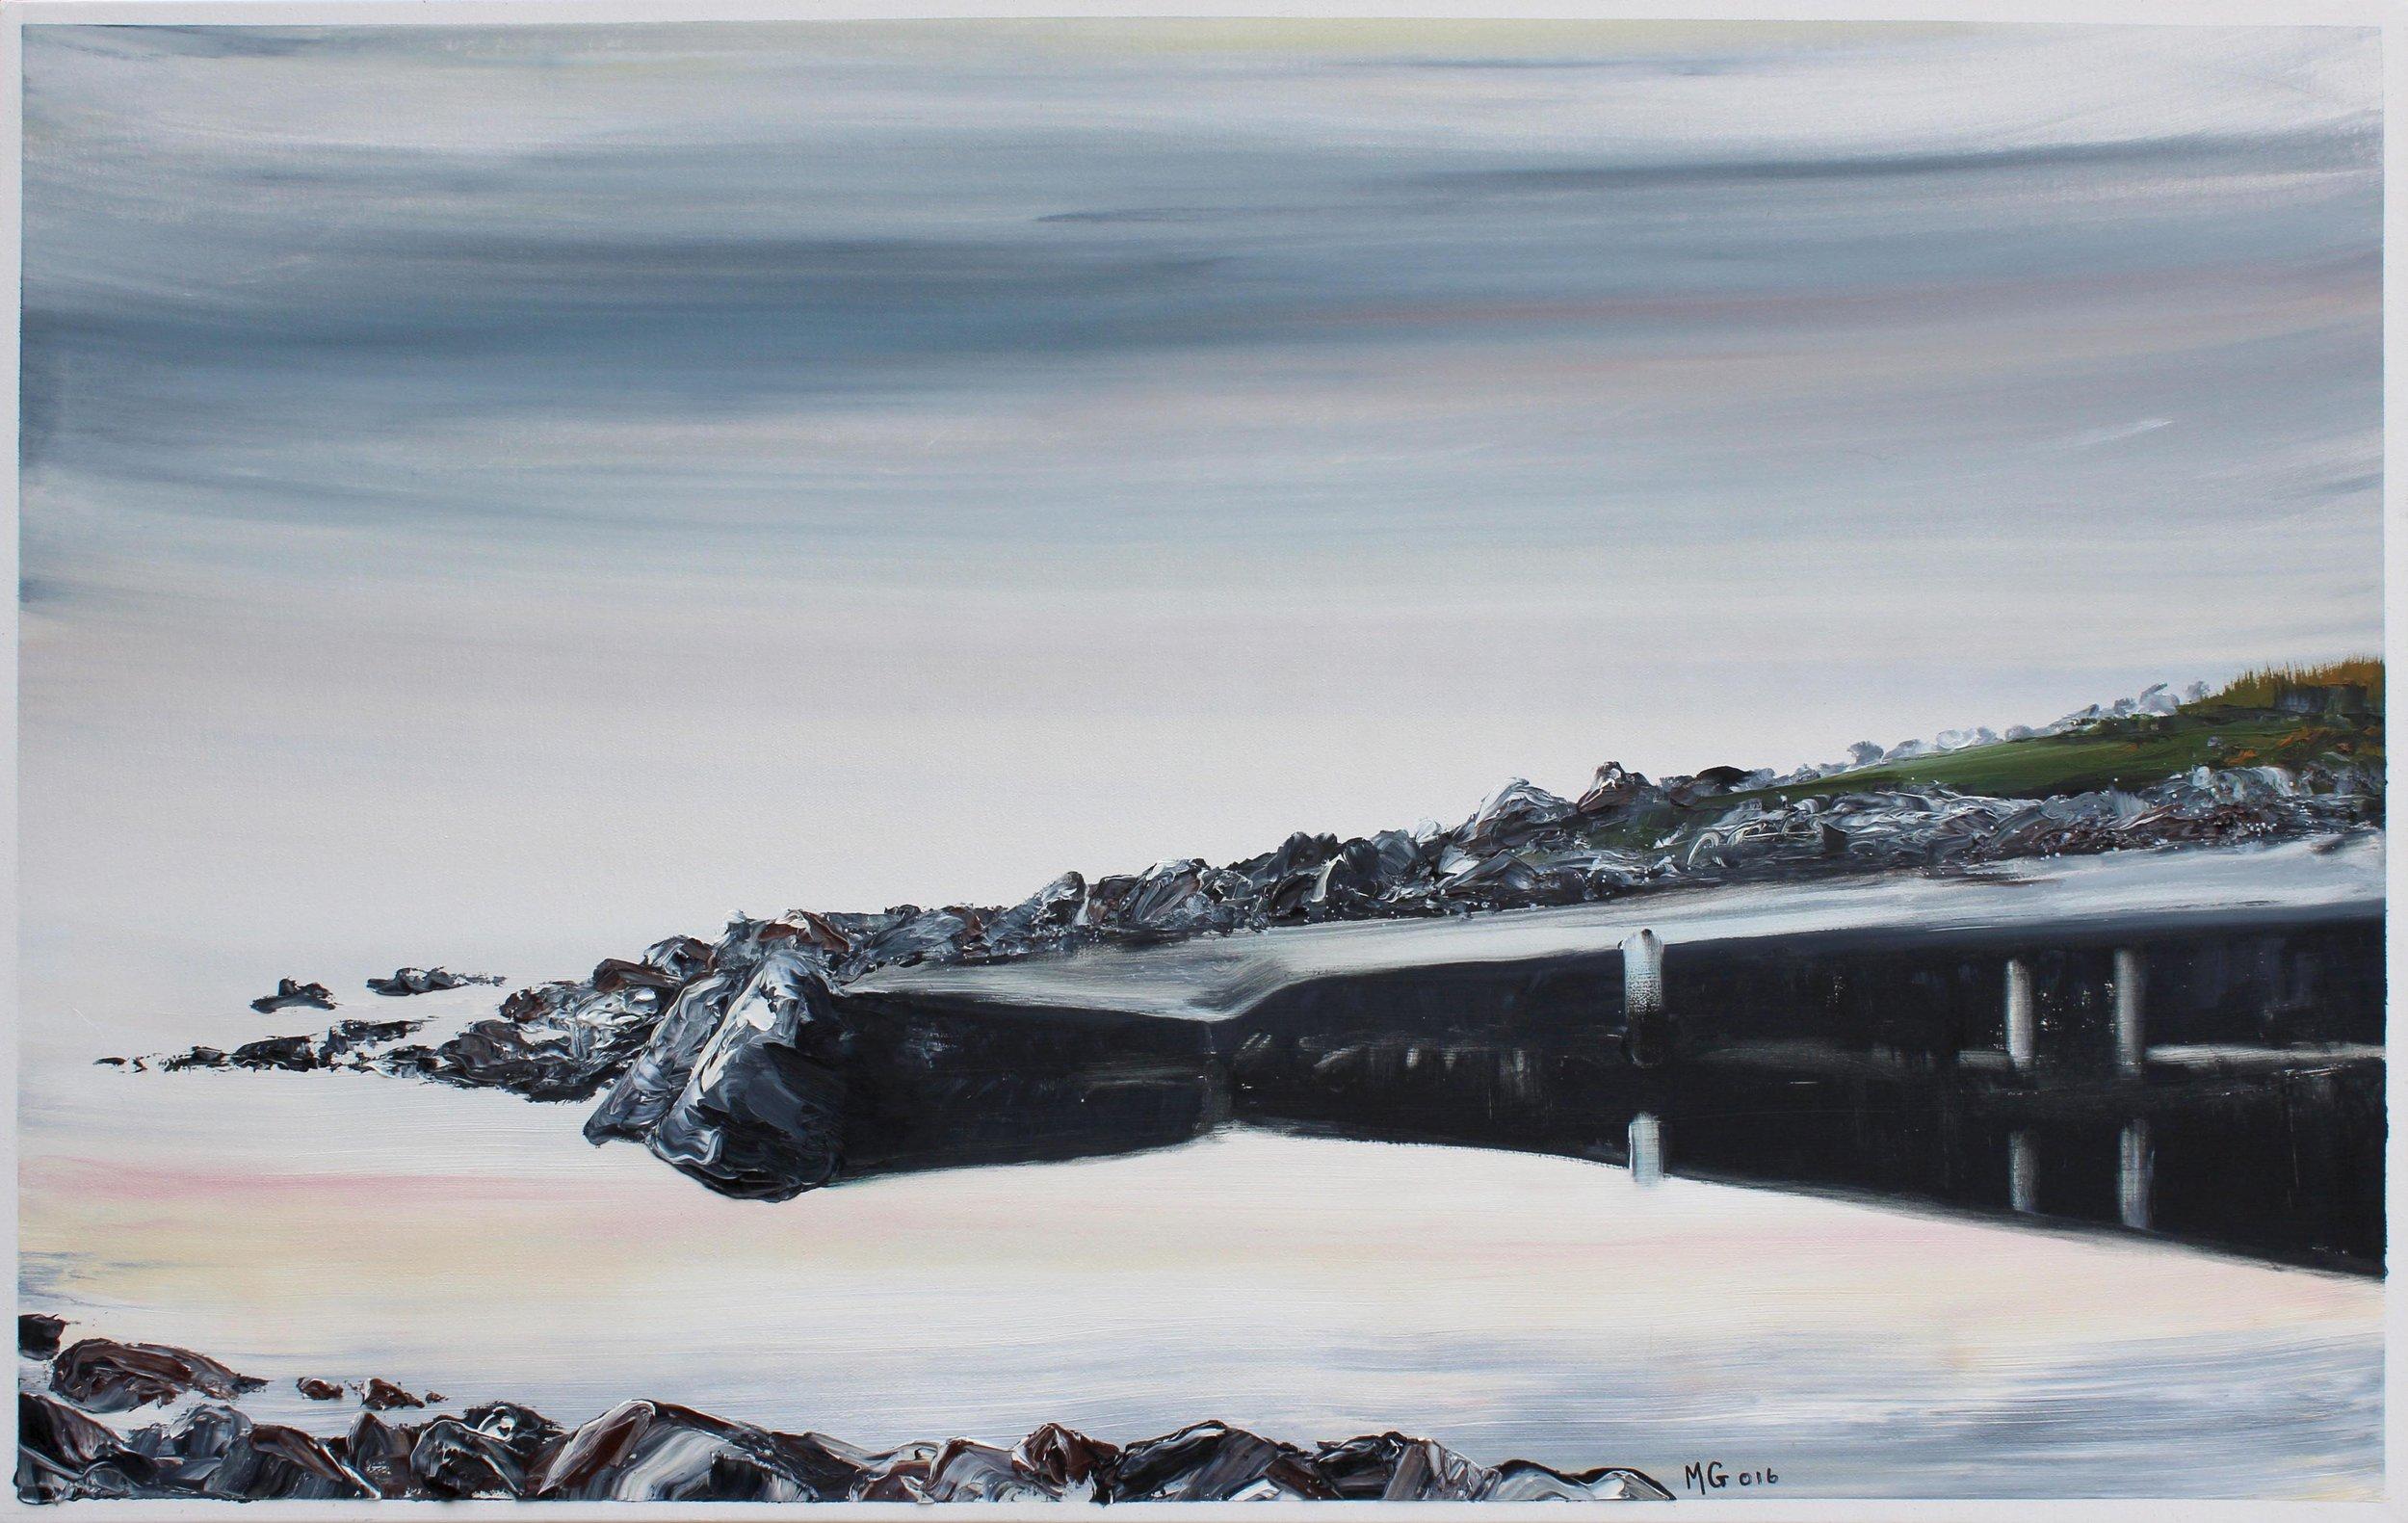 7. GALLAGHER_Martin_Early Morning Light_122cmx76cm_Oil on Canvas.jpg